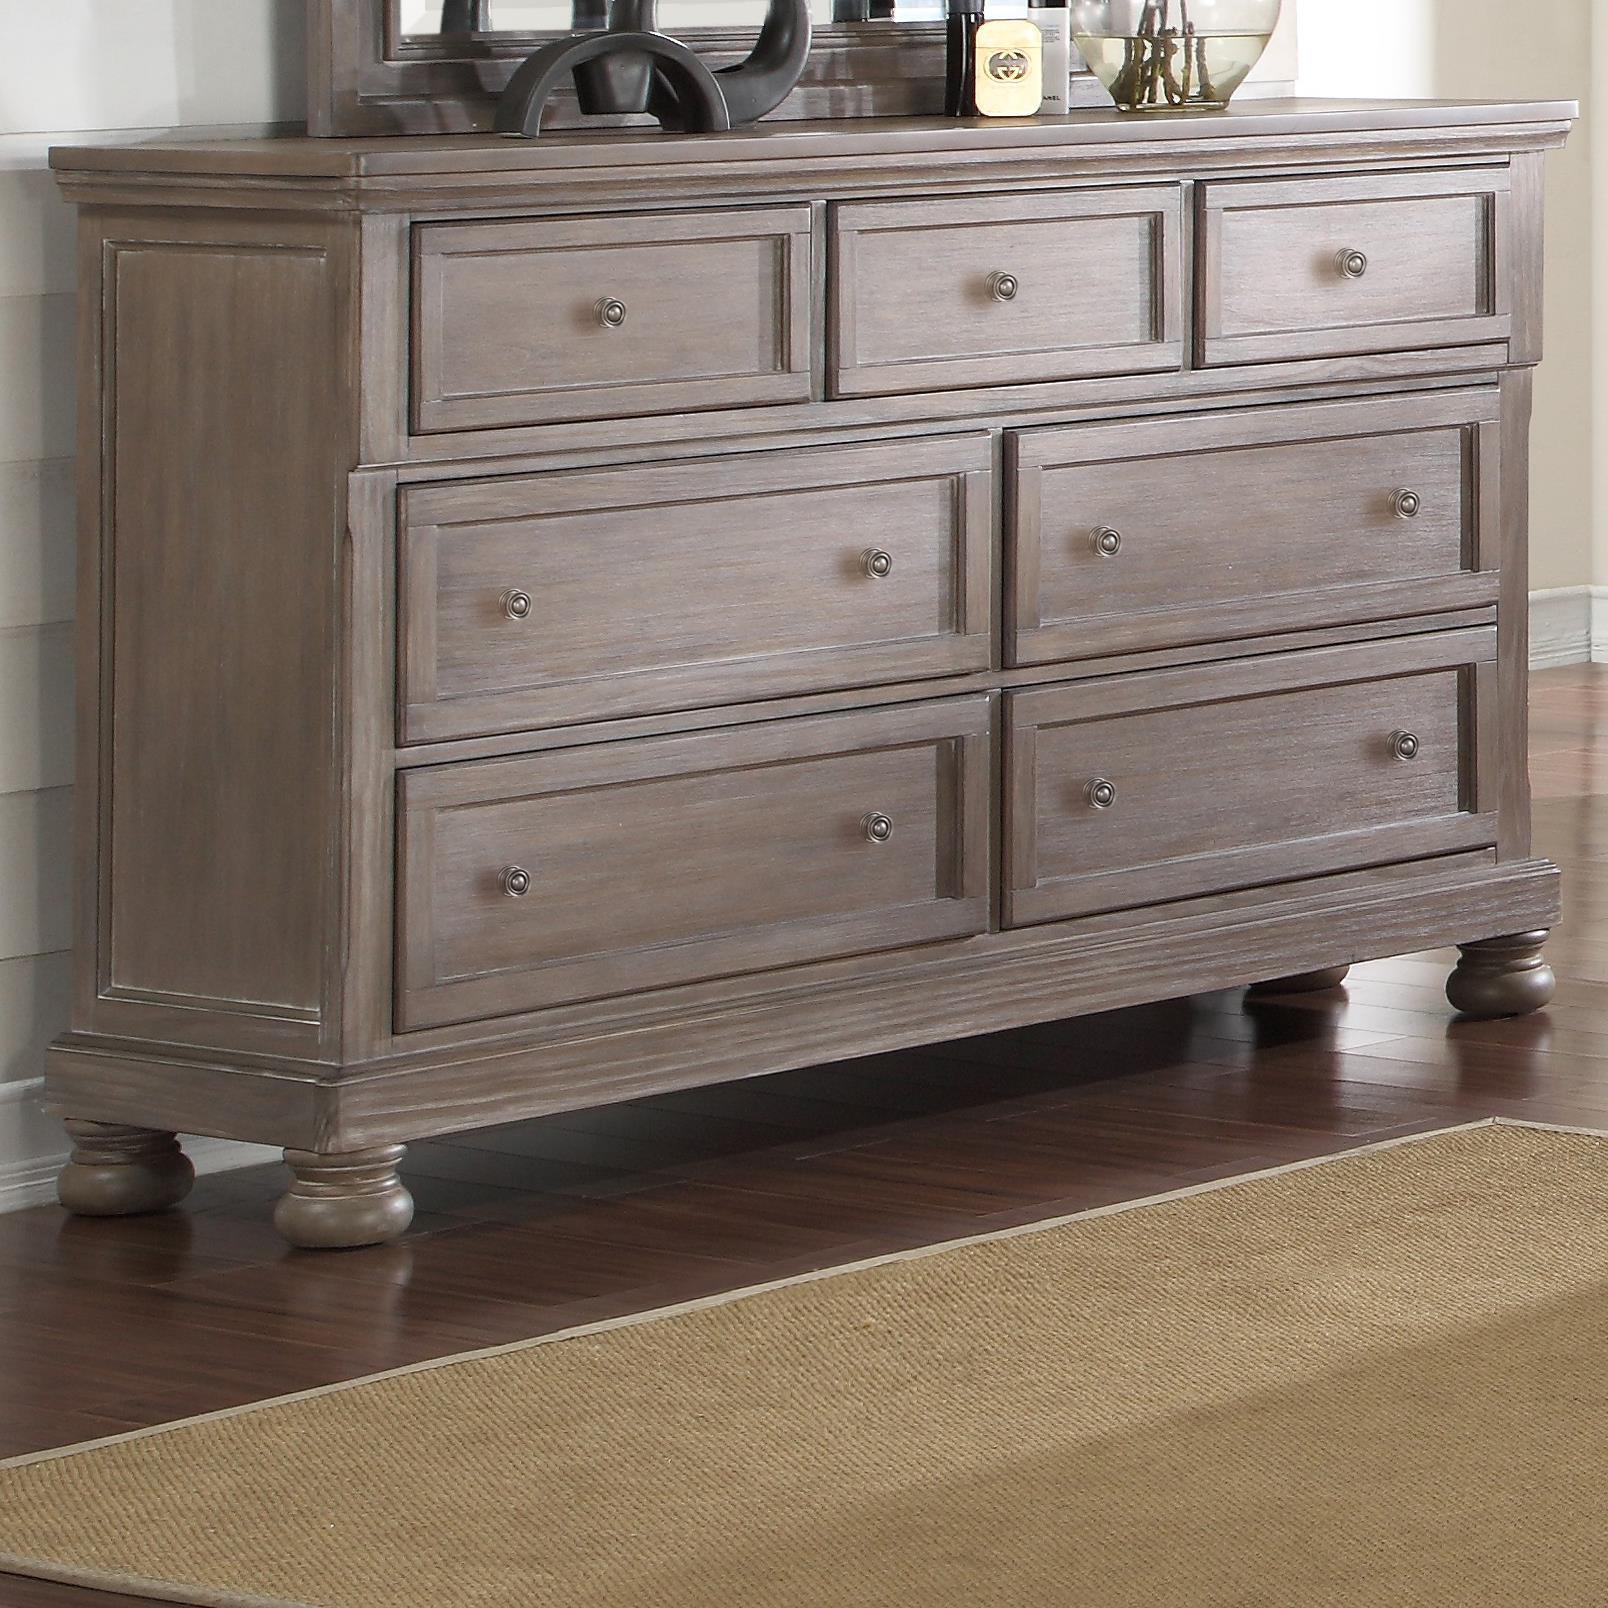 Allegra Dresser by New Classic at Carolina Direct